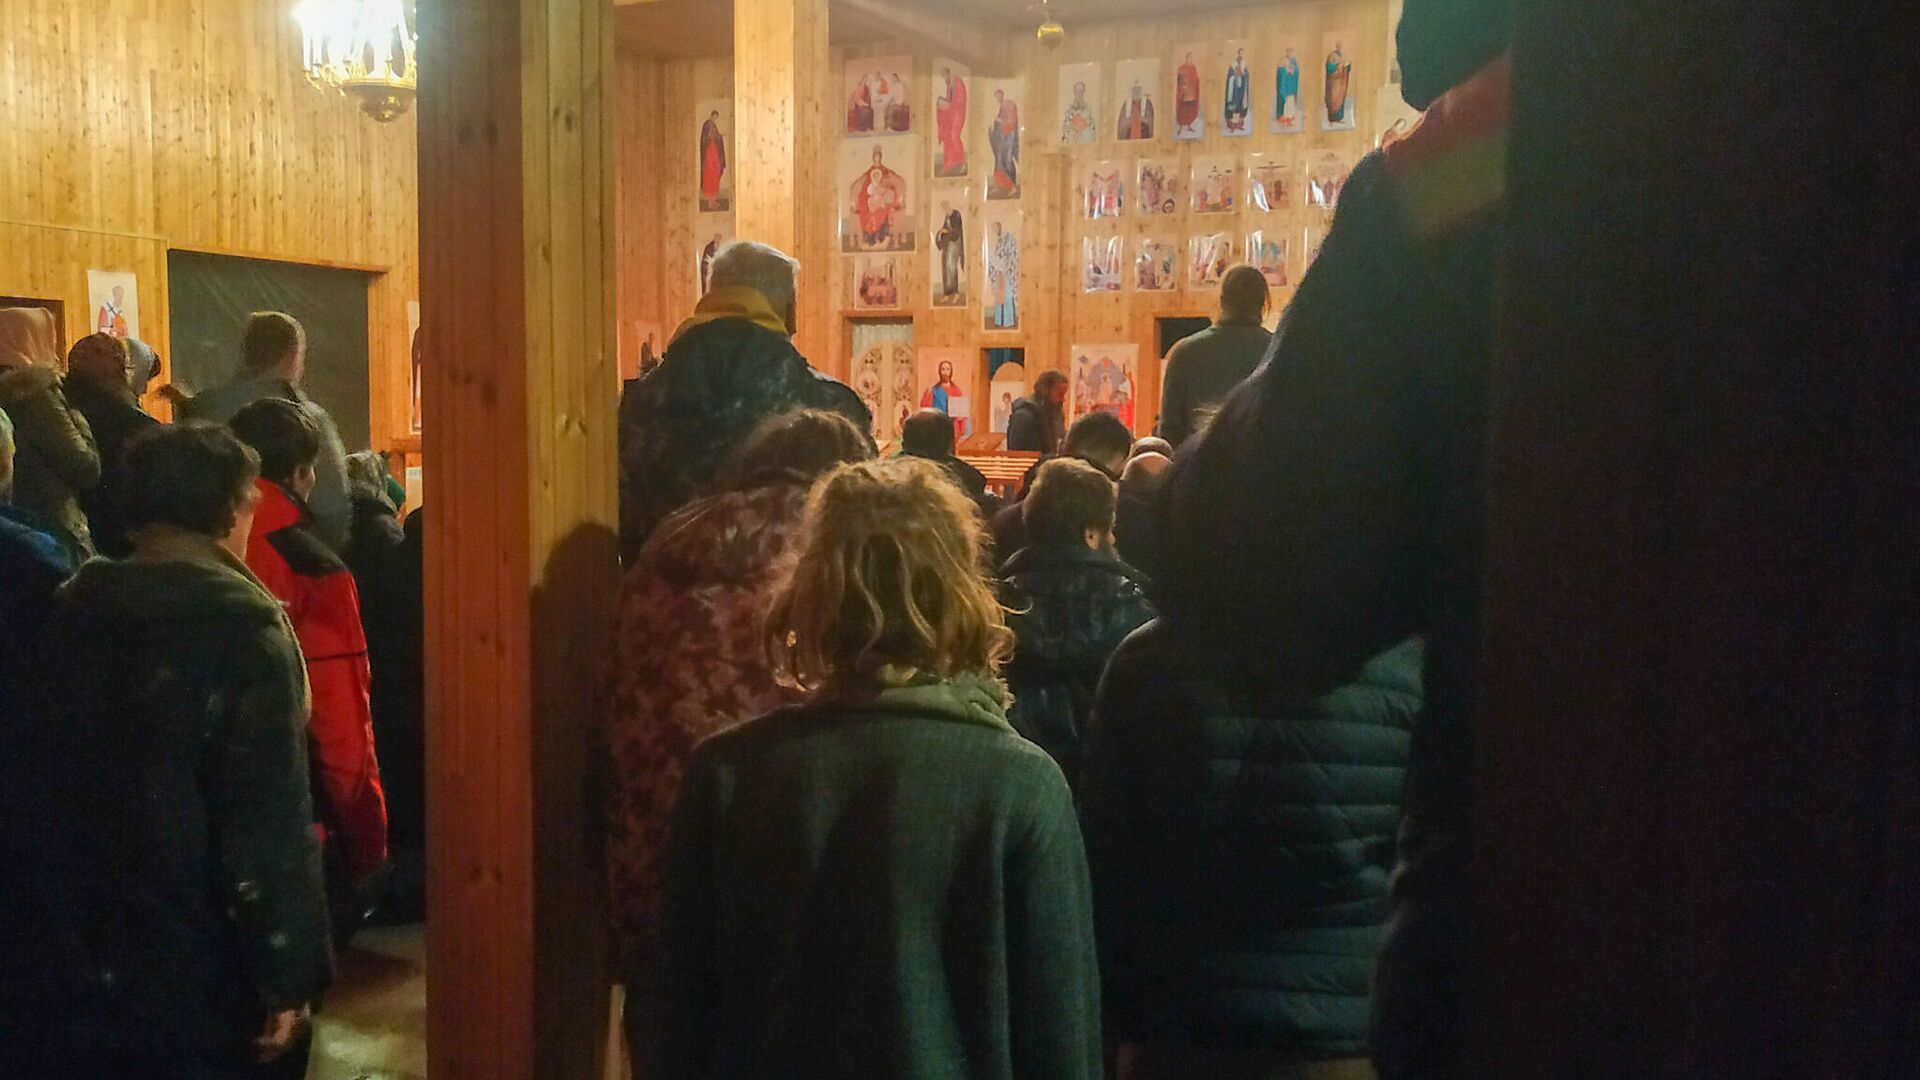 Ночная служба в храме Царя-мученика Николая в Чихачево - РИА Новости, 1920, 03.11.2020